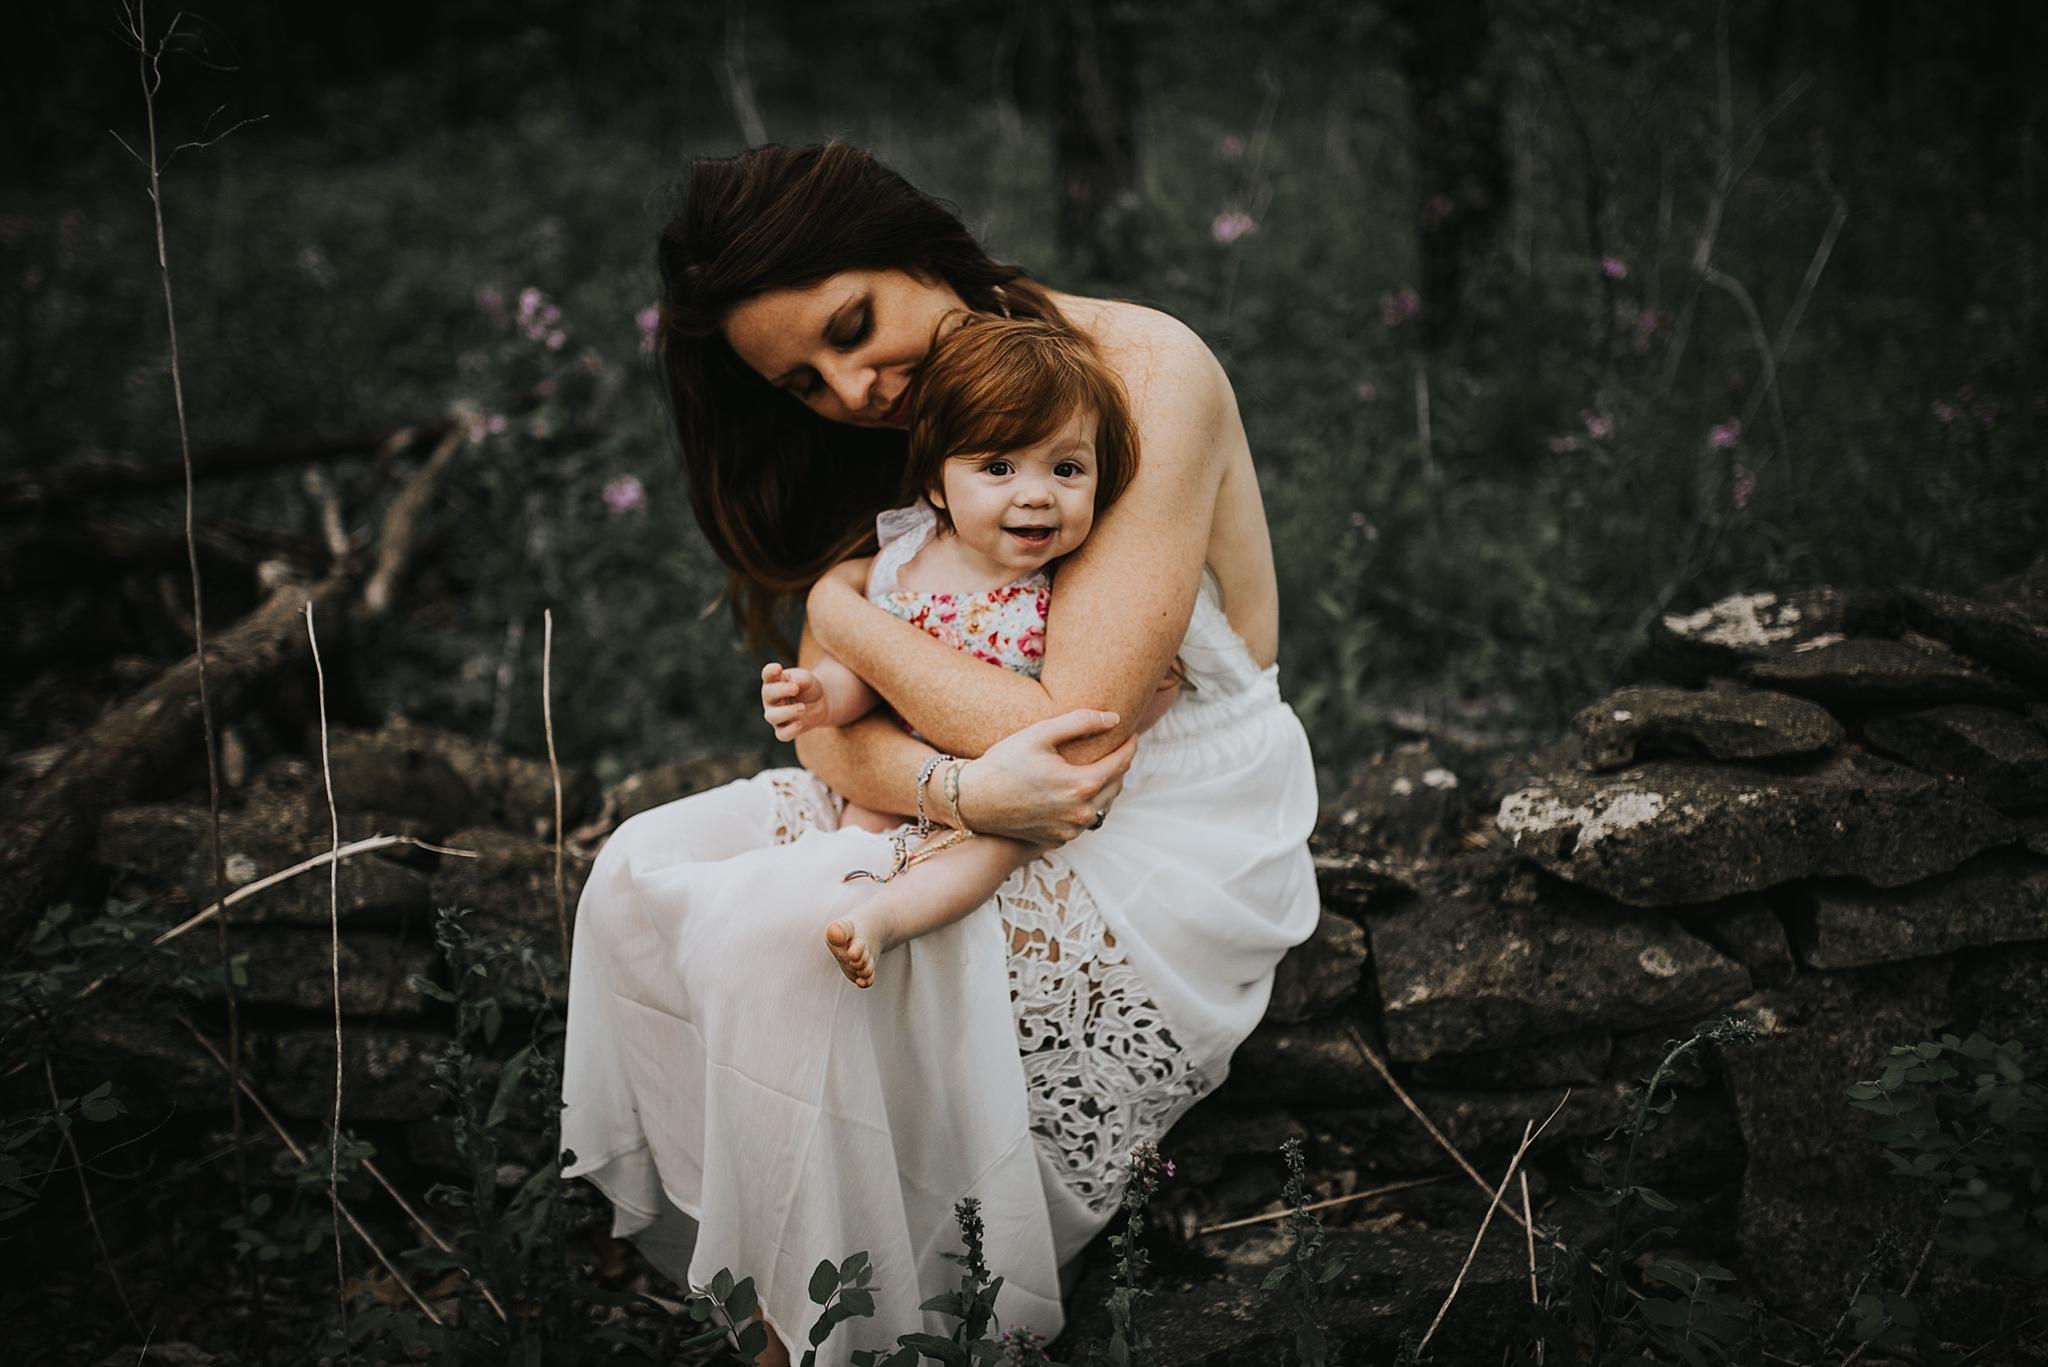 twyla jones photography - mother daughter - field and forest-4746_treasure coast florida.jpg